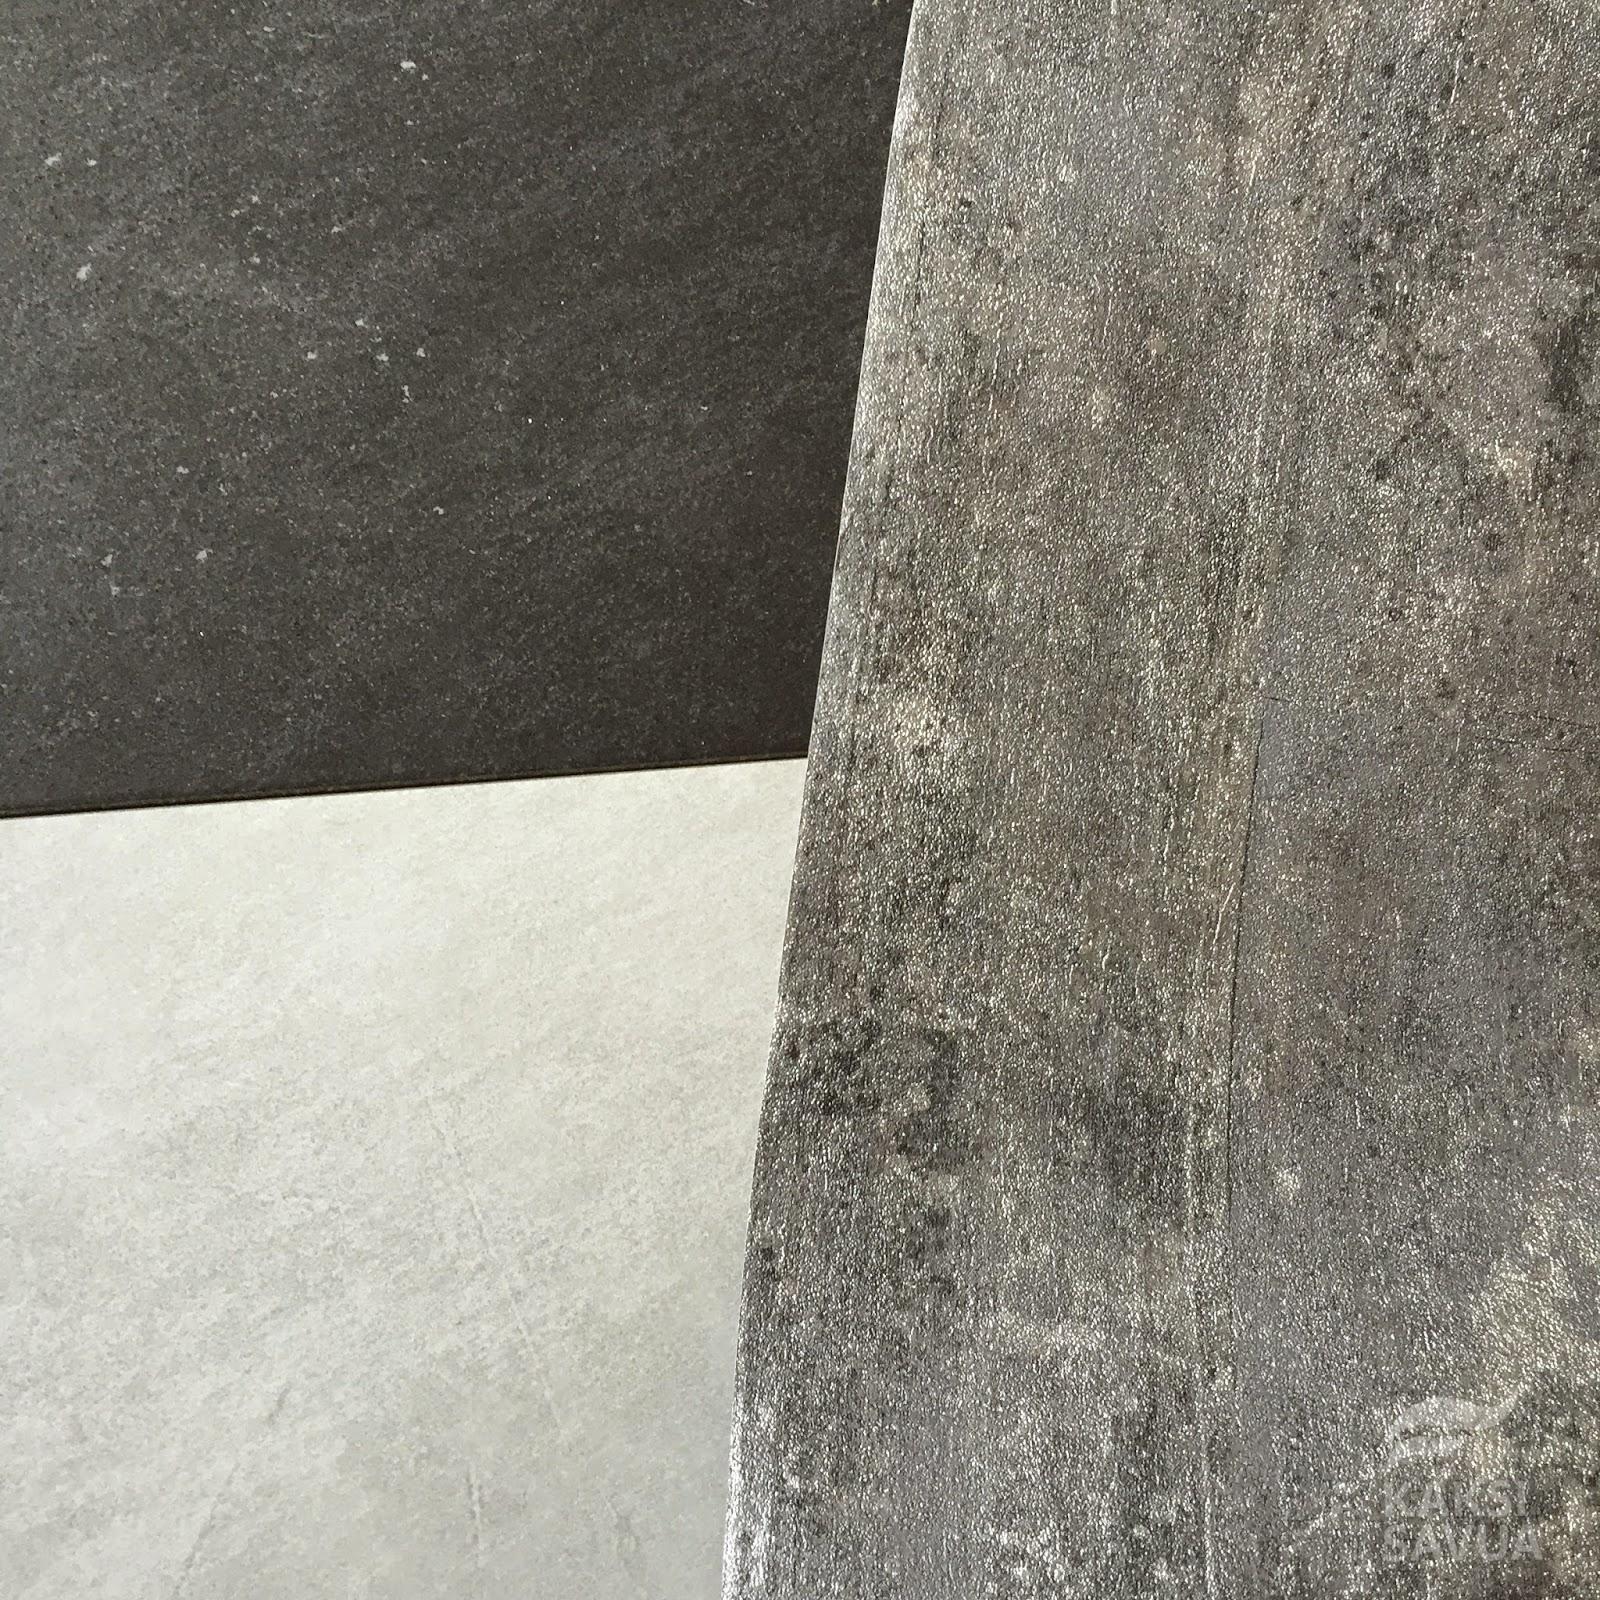 Kaakelikeskuksen Piemme moder k11 dgrey ja Piemme moder k9 grey